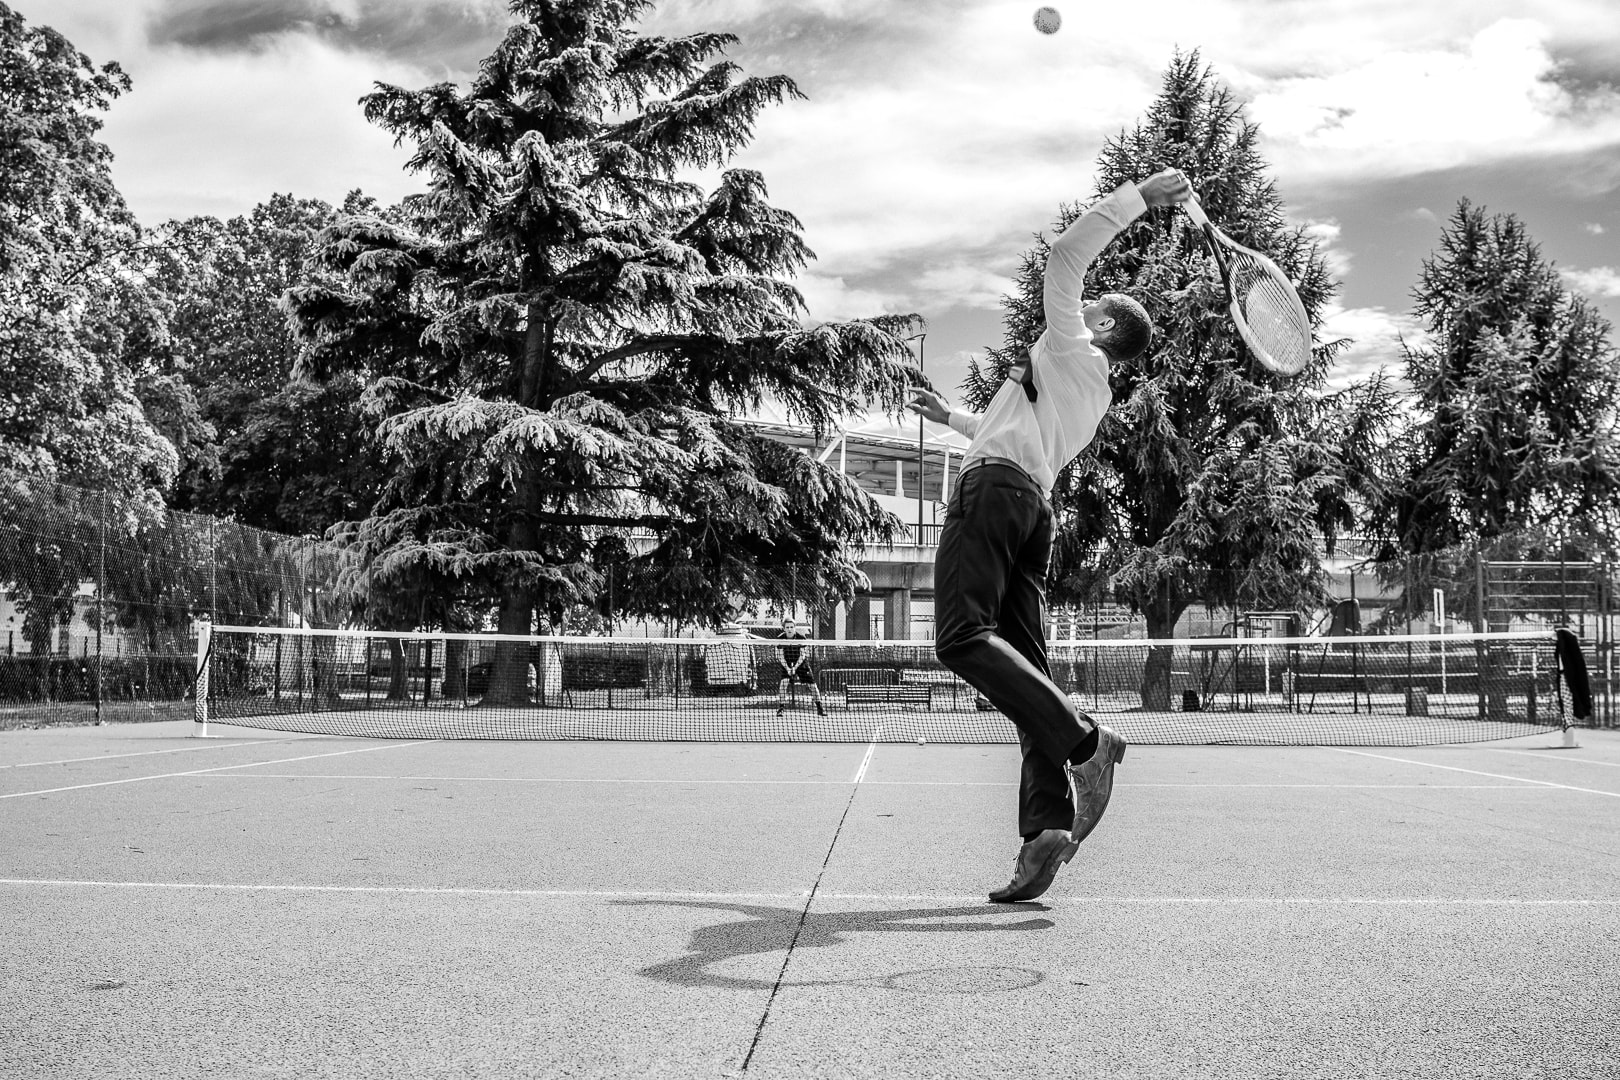 trezors-photography-photographe-professionnel-toulouse-31-sport-lifestyle-tennis